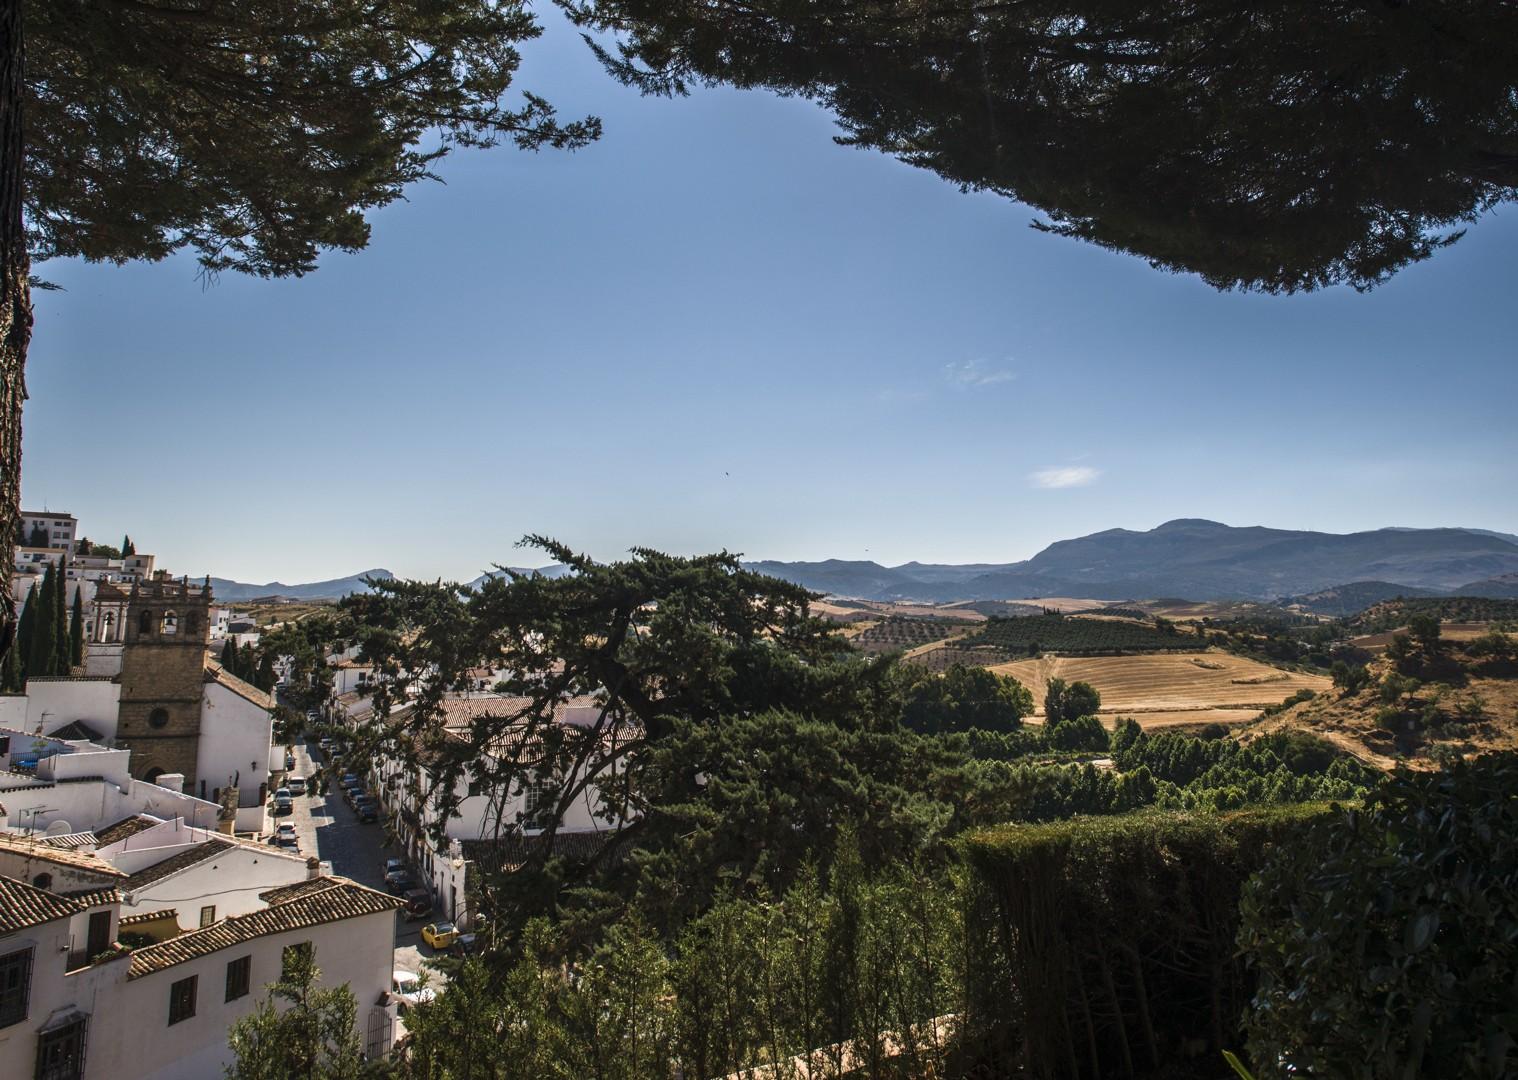 ronda3.jpg - Southern Spain - Roads of Ronda - Road Cycling